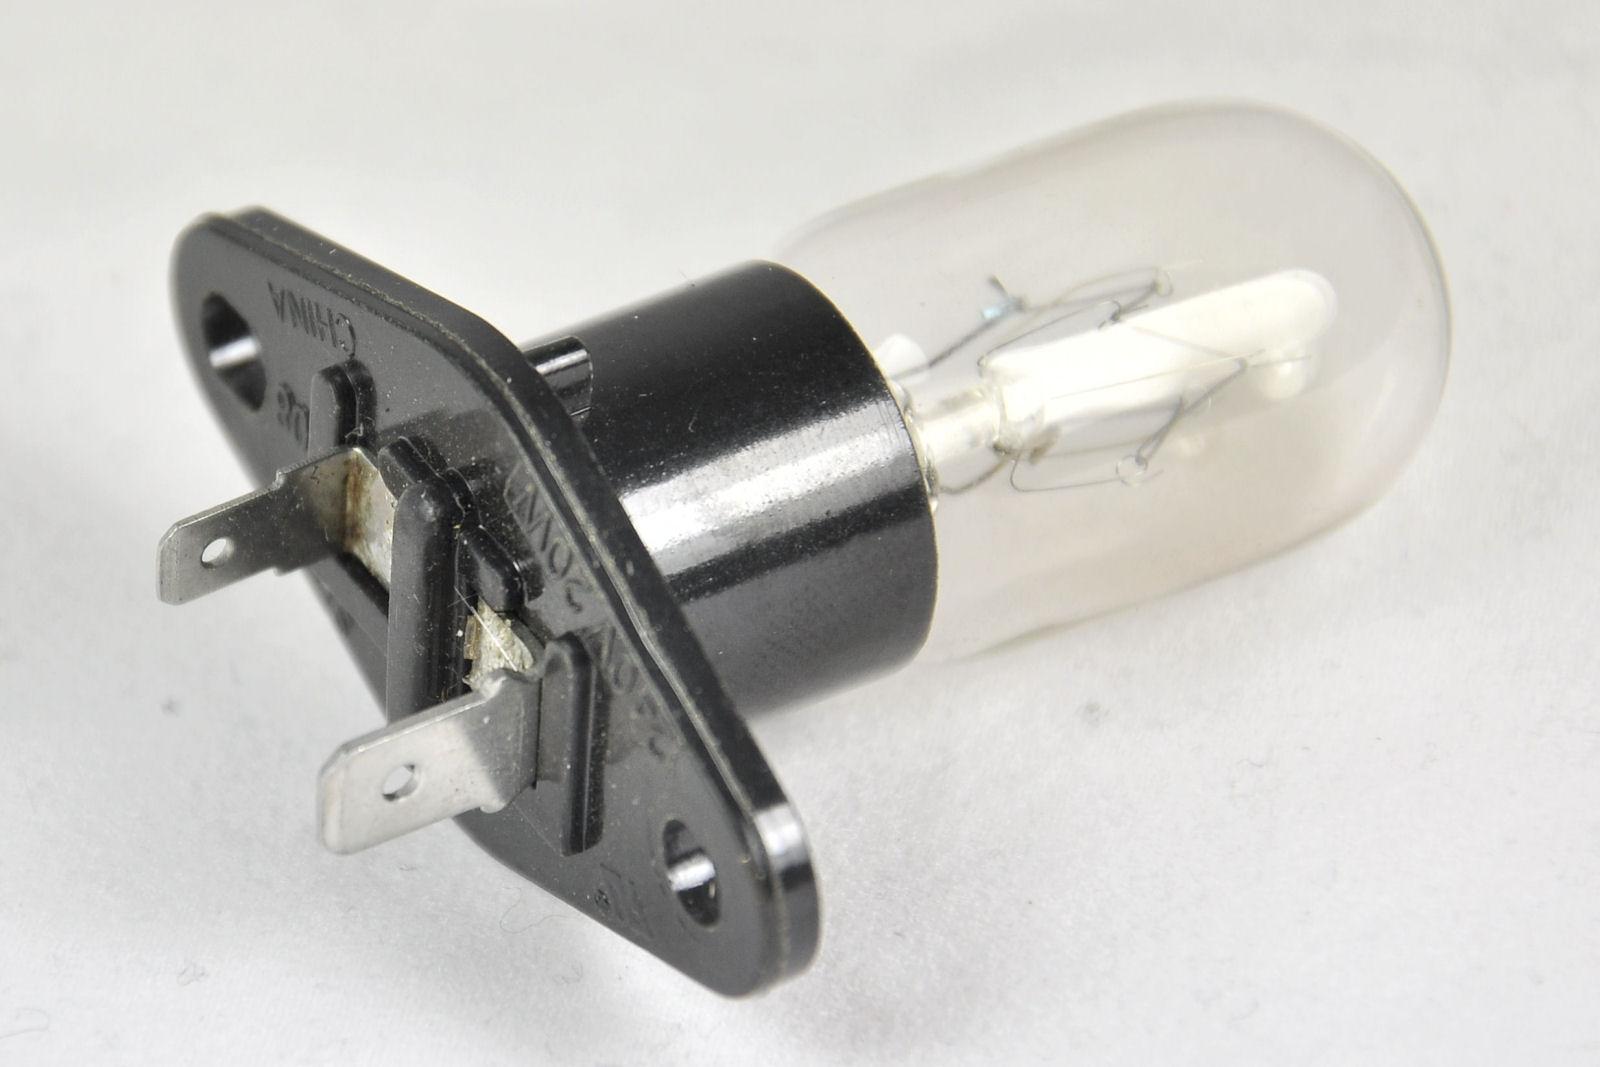 Panasonic Microwave Oven Lamp 240 Volts 20 Watts